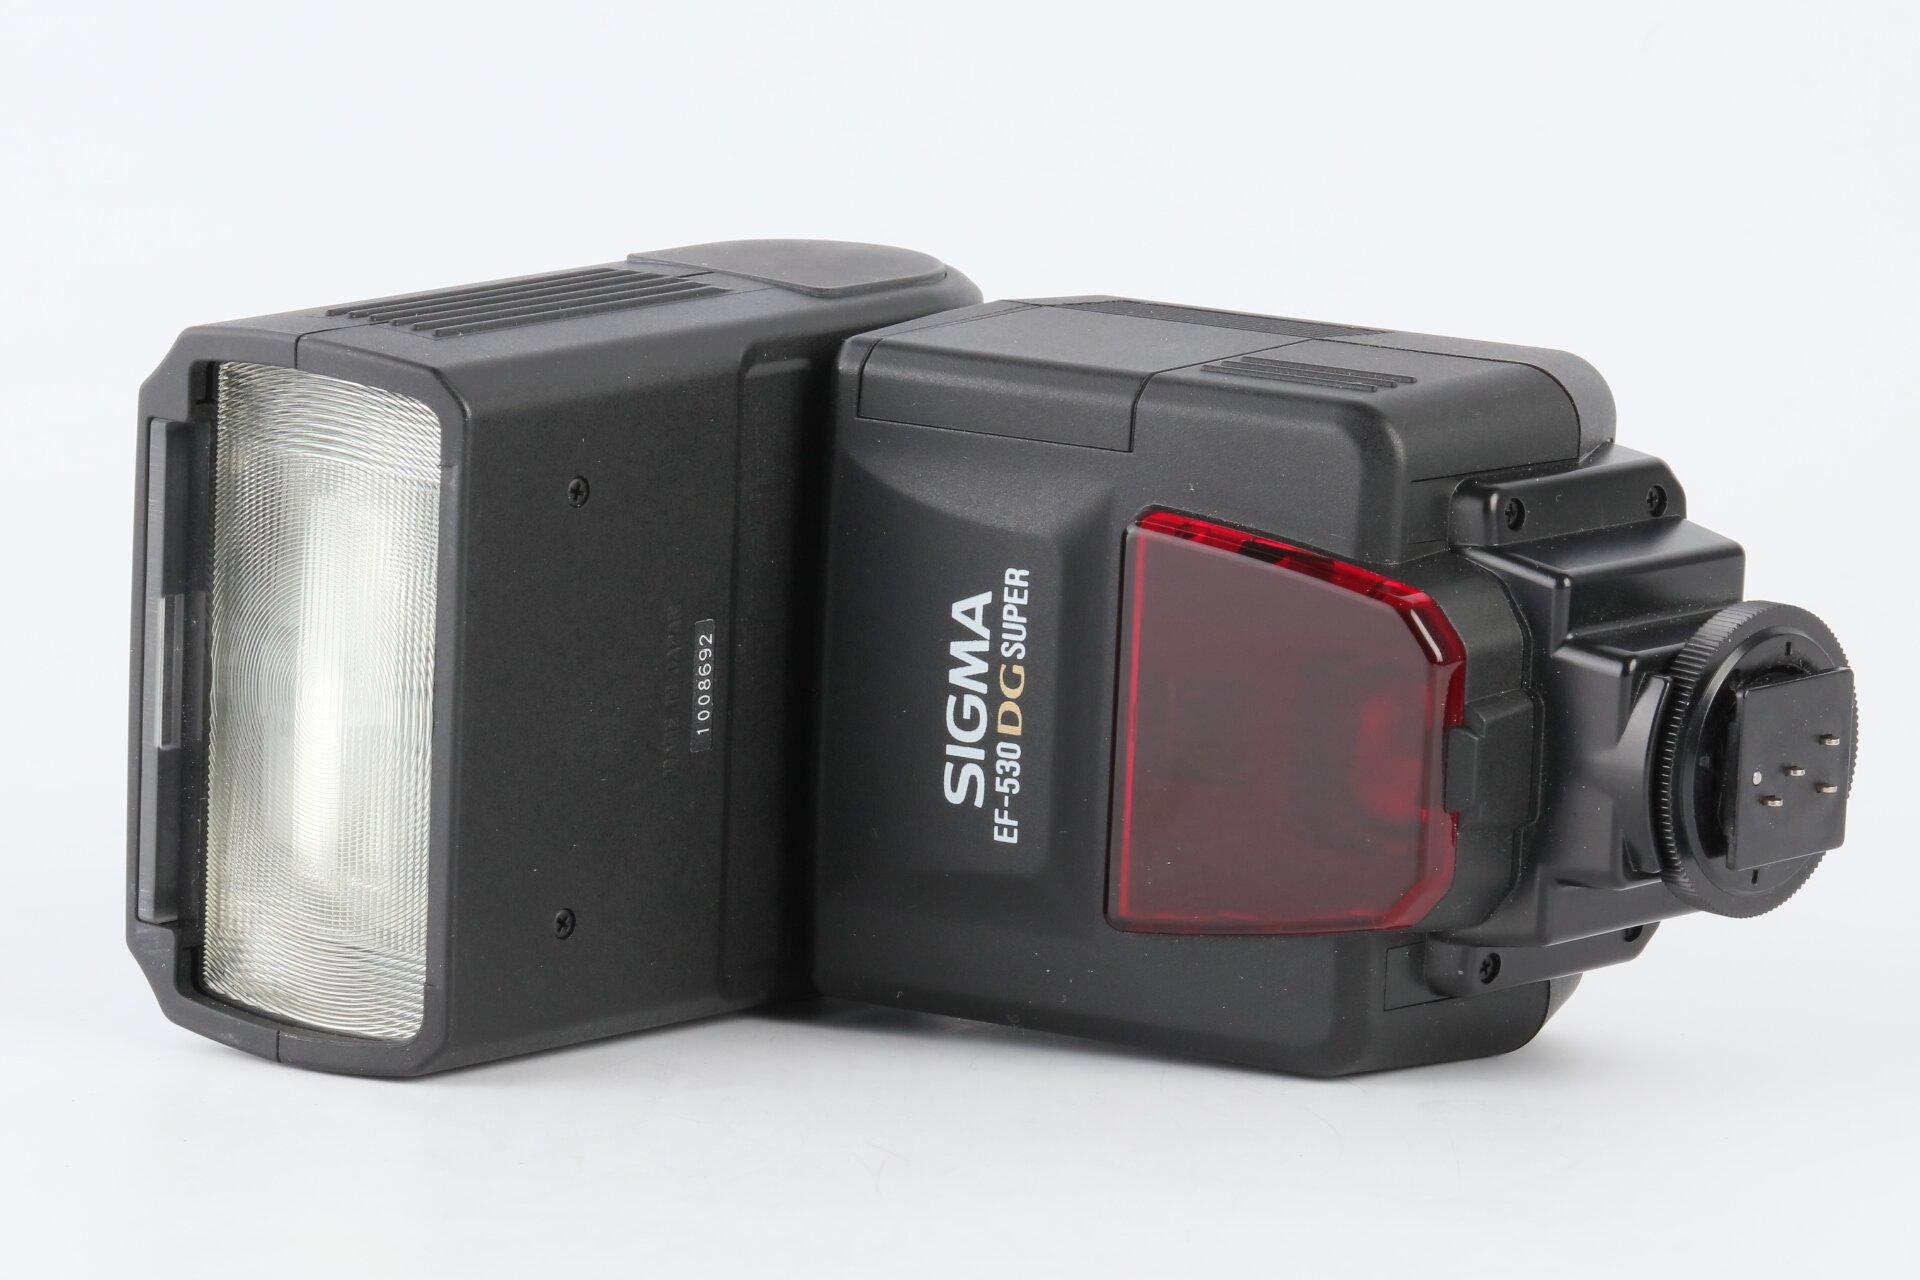 Sigma EF-530 DG Super Blitz f. Nikon AF